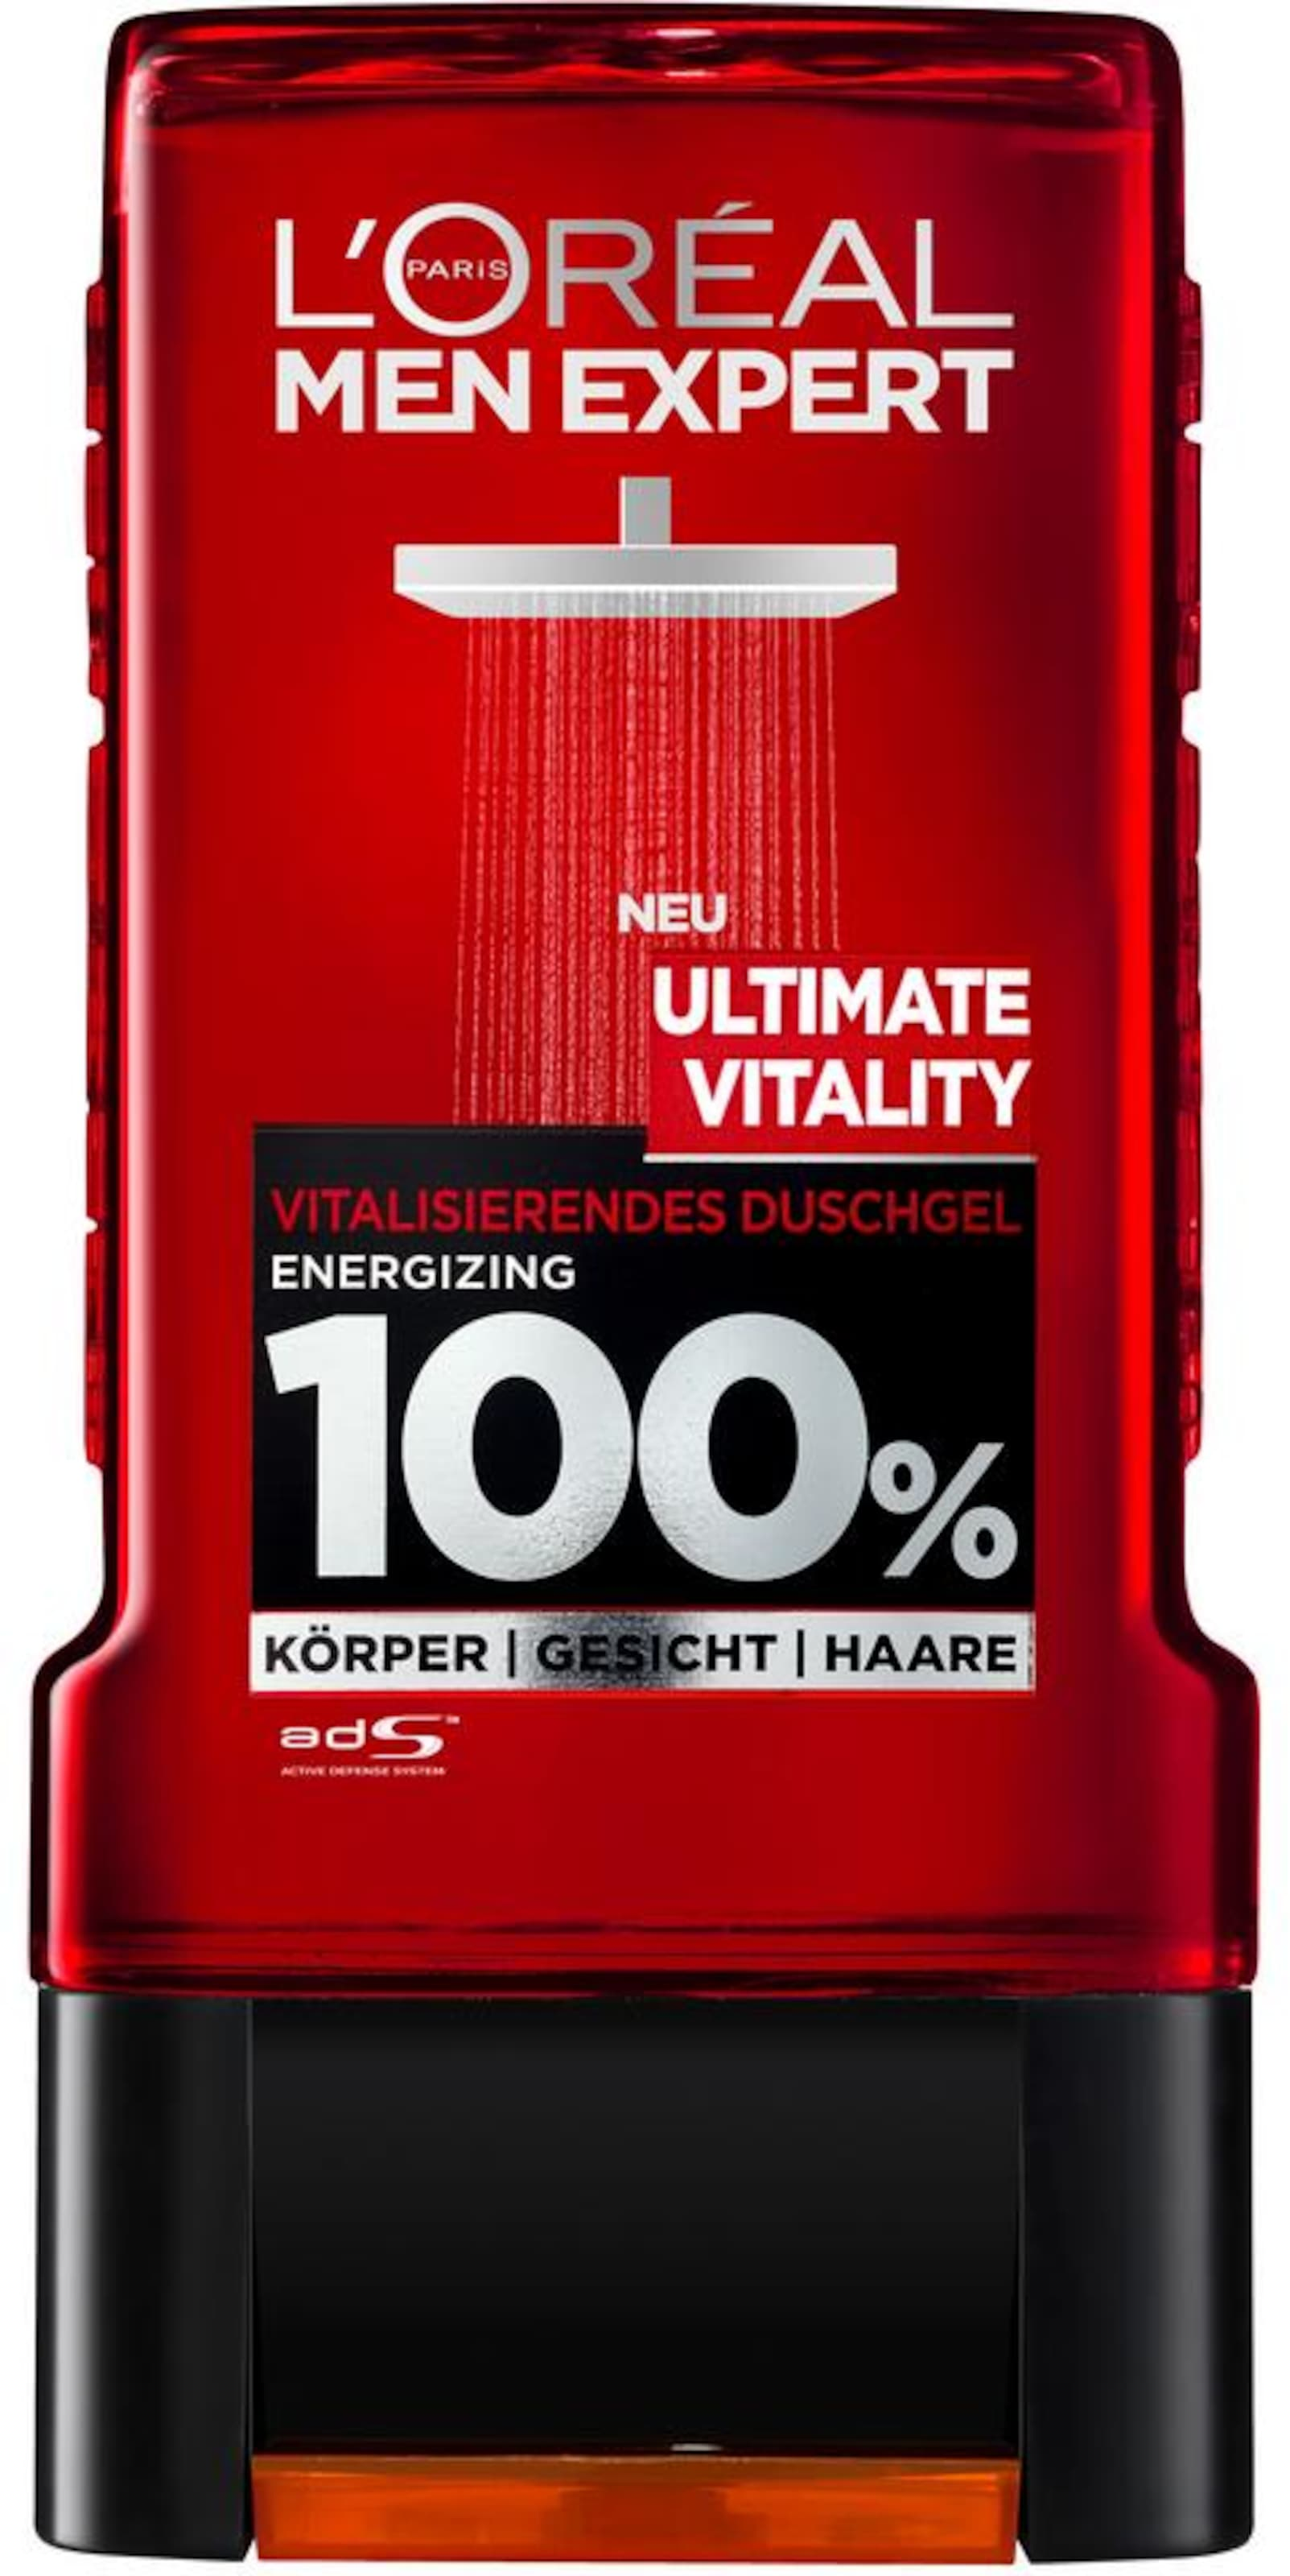 Expert L'oréal Schwarz Men Paris Set In DunkelgrauFeuerrot 'vitality' Fl1J35uTKc